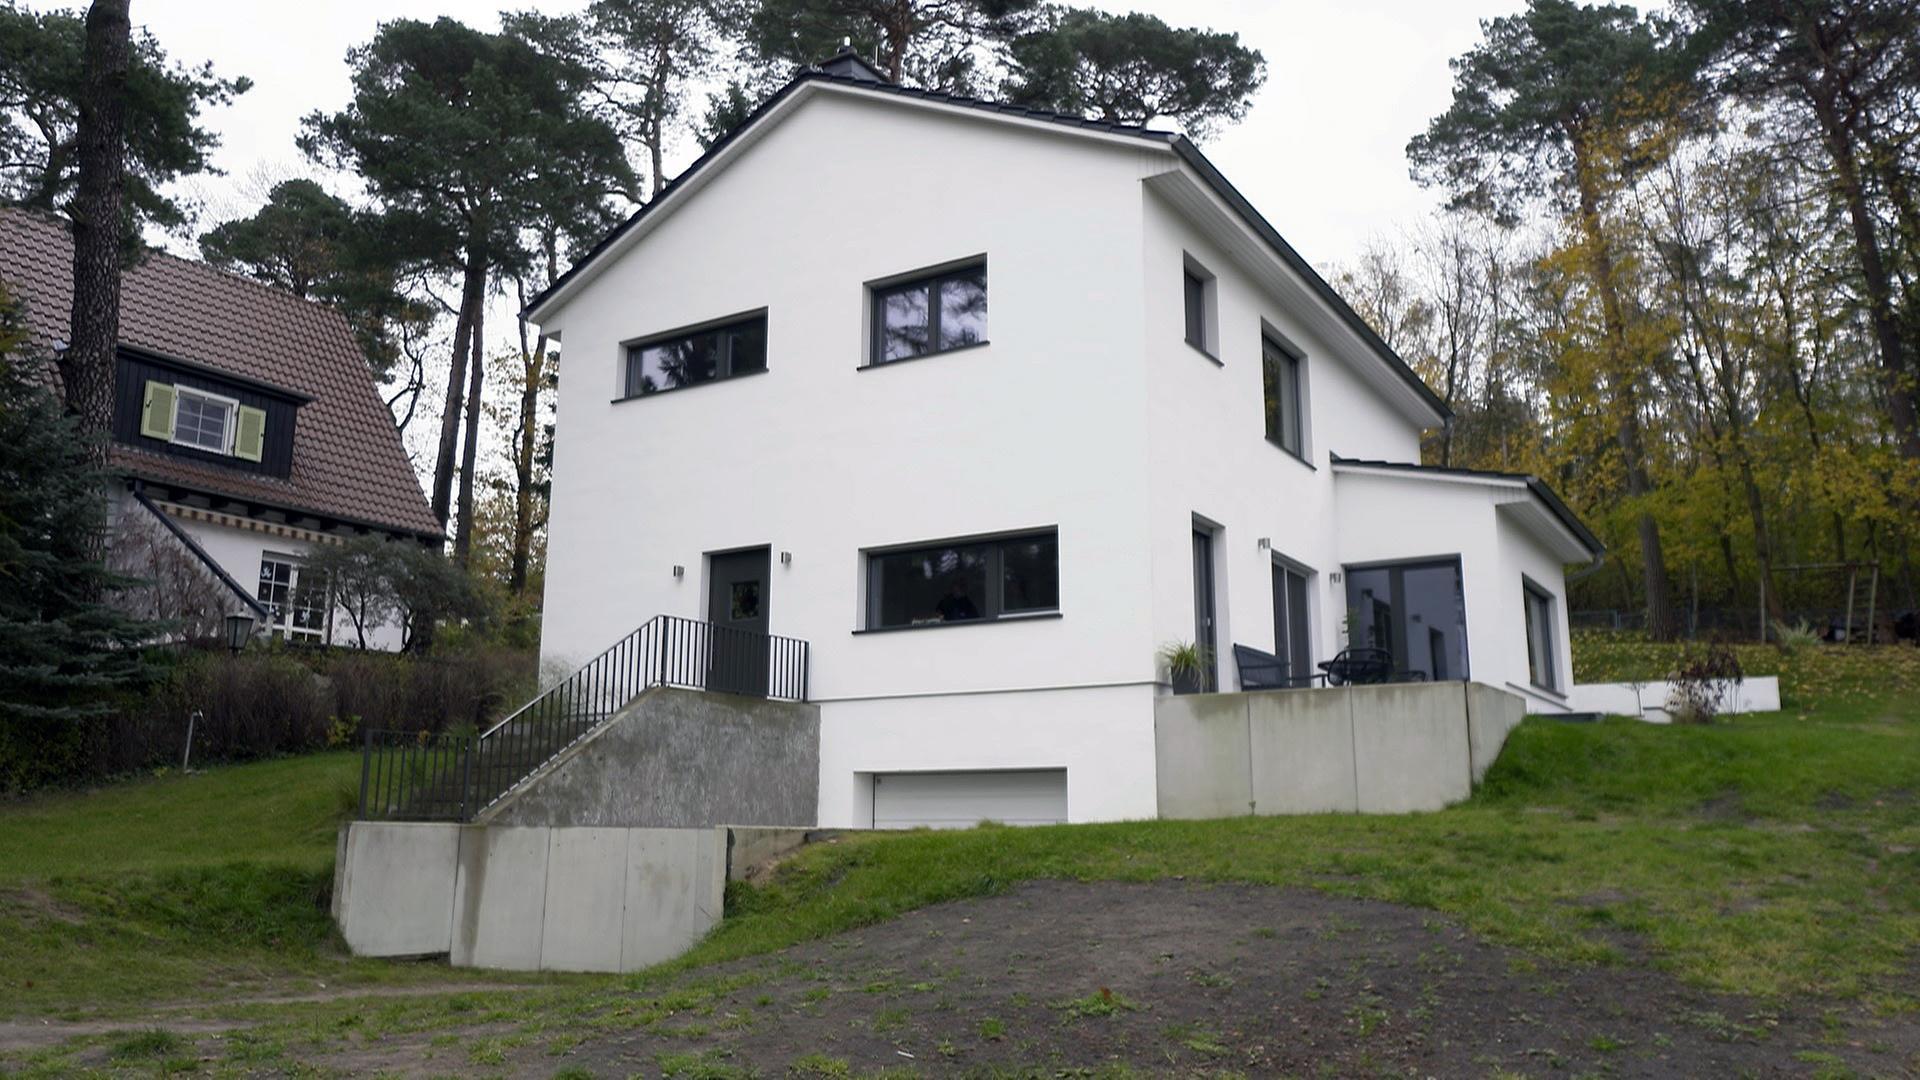 33 Neu Zwangsversteigerung Haus Kaufen Bilder